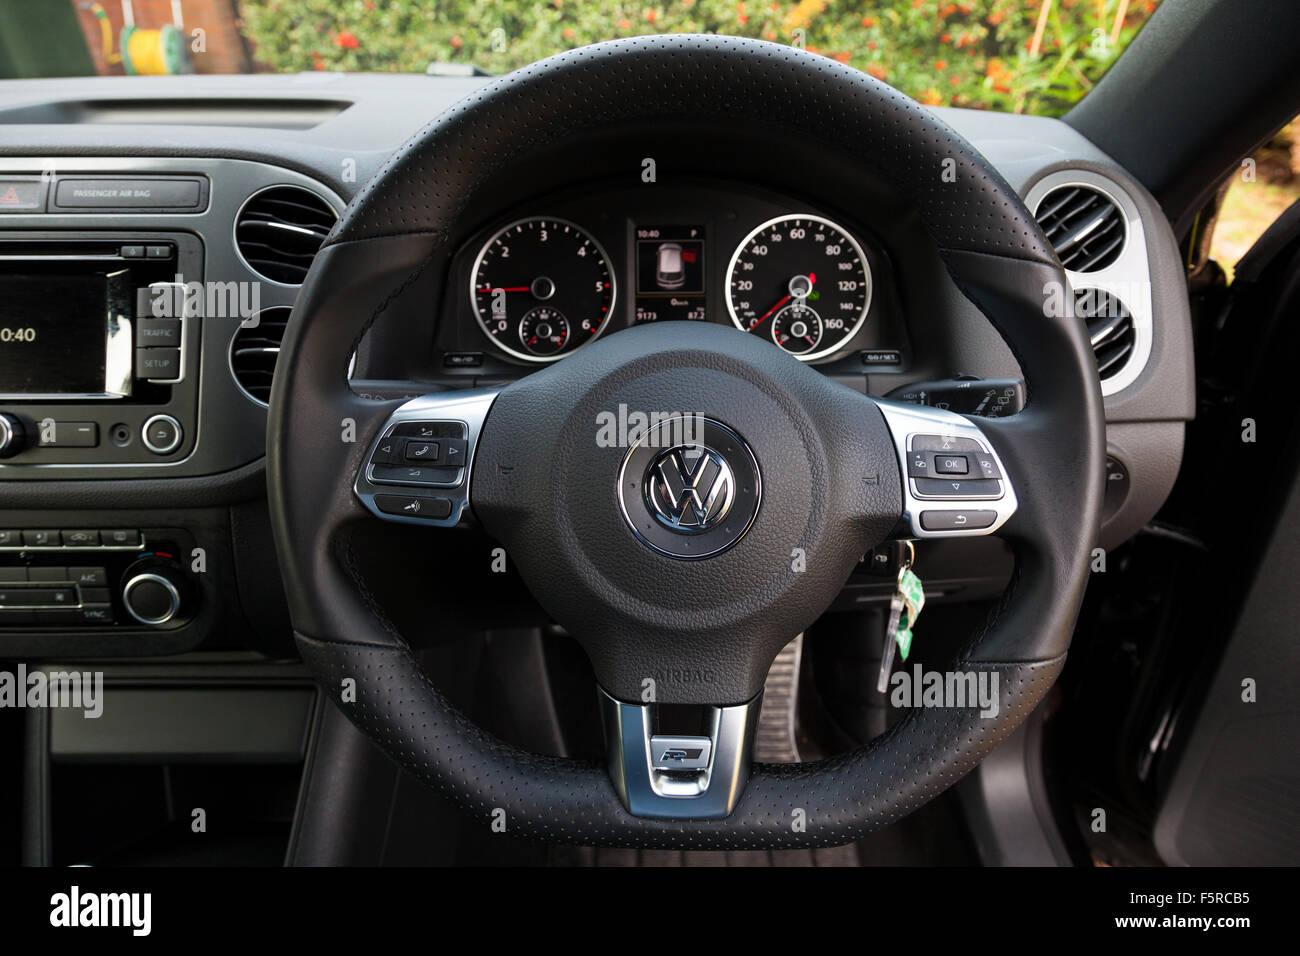 The interior of a 2015 vw tiguan 2 0 tdi bluemotion technology r line stock photo royalty free - Volkswagen tiguan interior ...